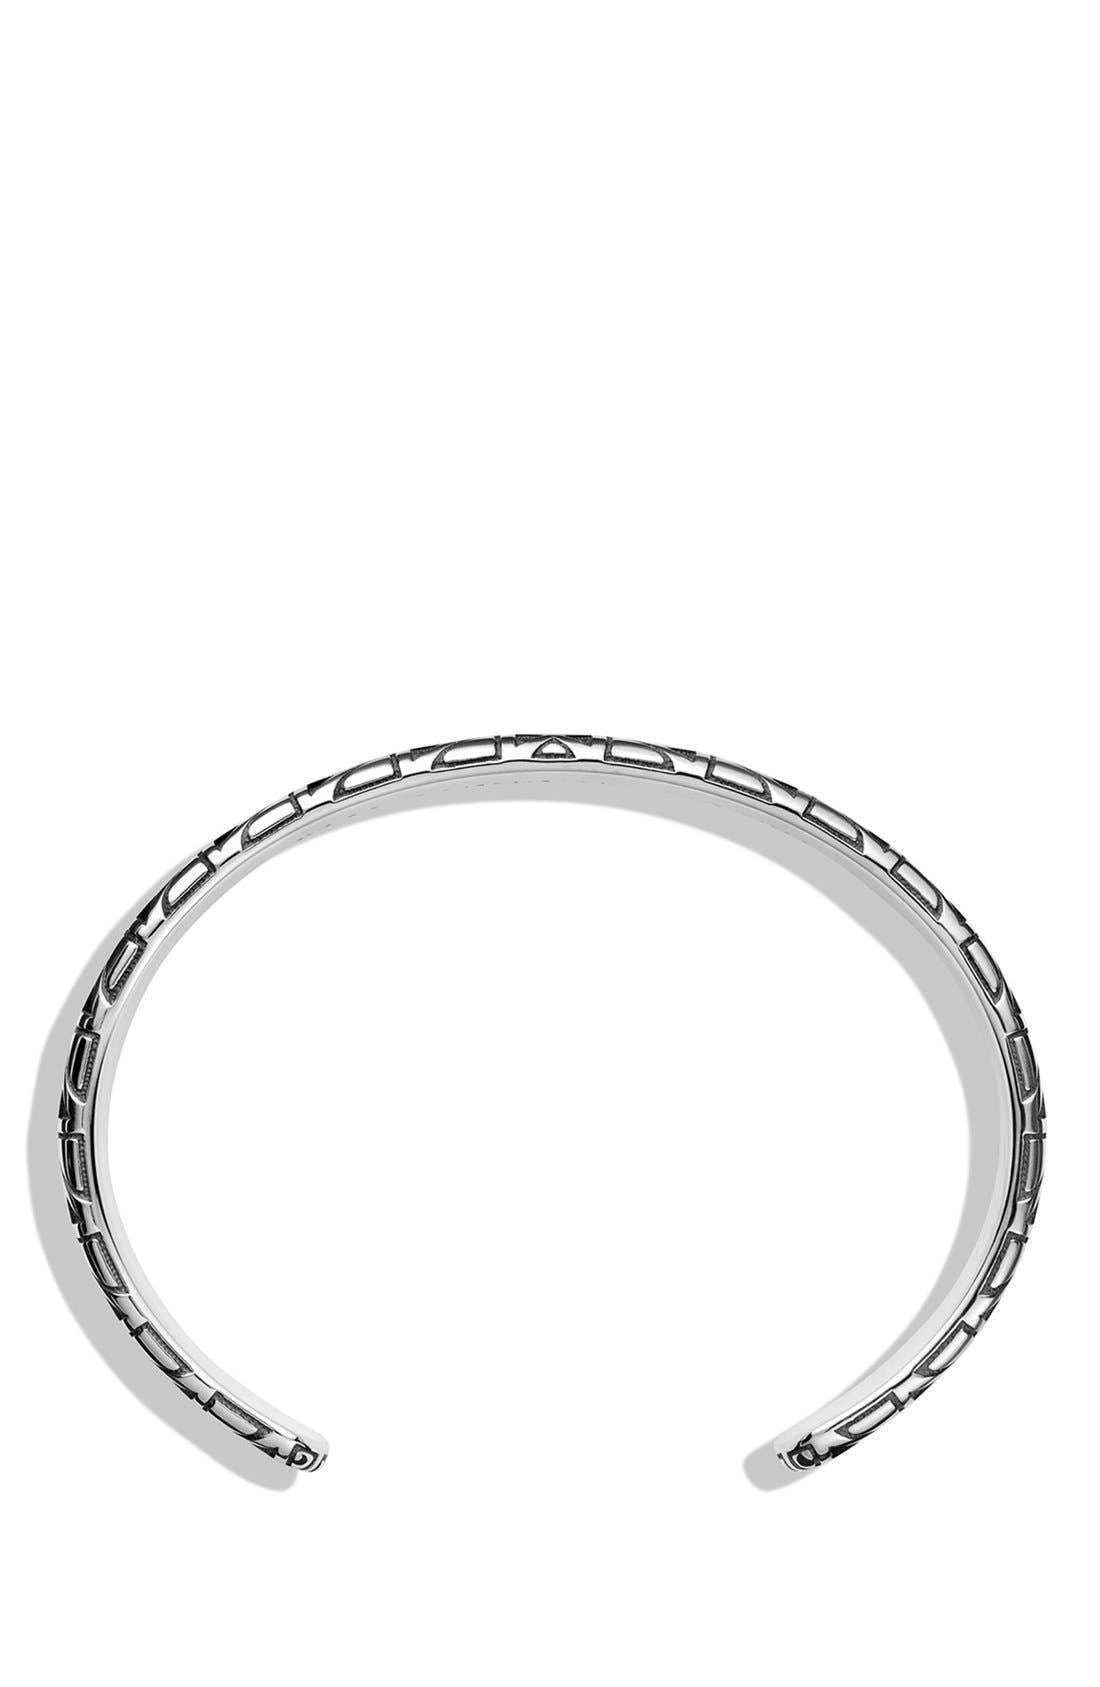 DAVID YURMAN,                             Southwest Cuff Bracelet with 18K Gold,                             Alternate thumbnail 2, color,                             040